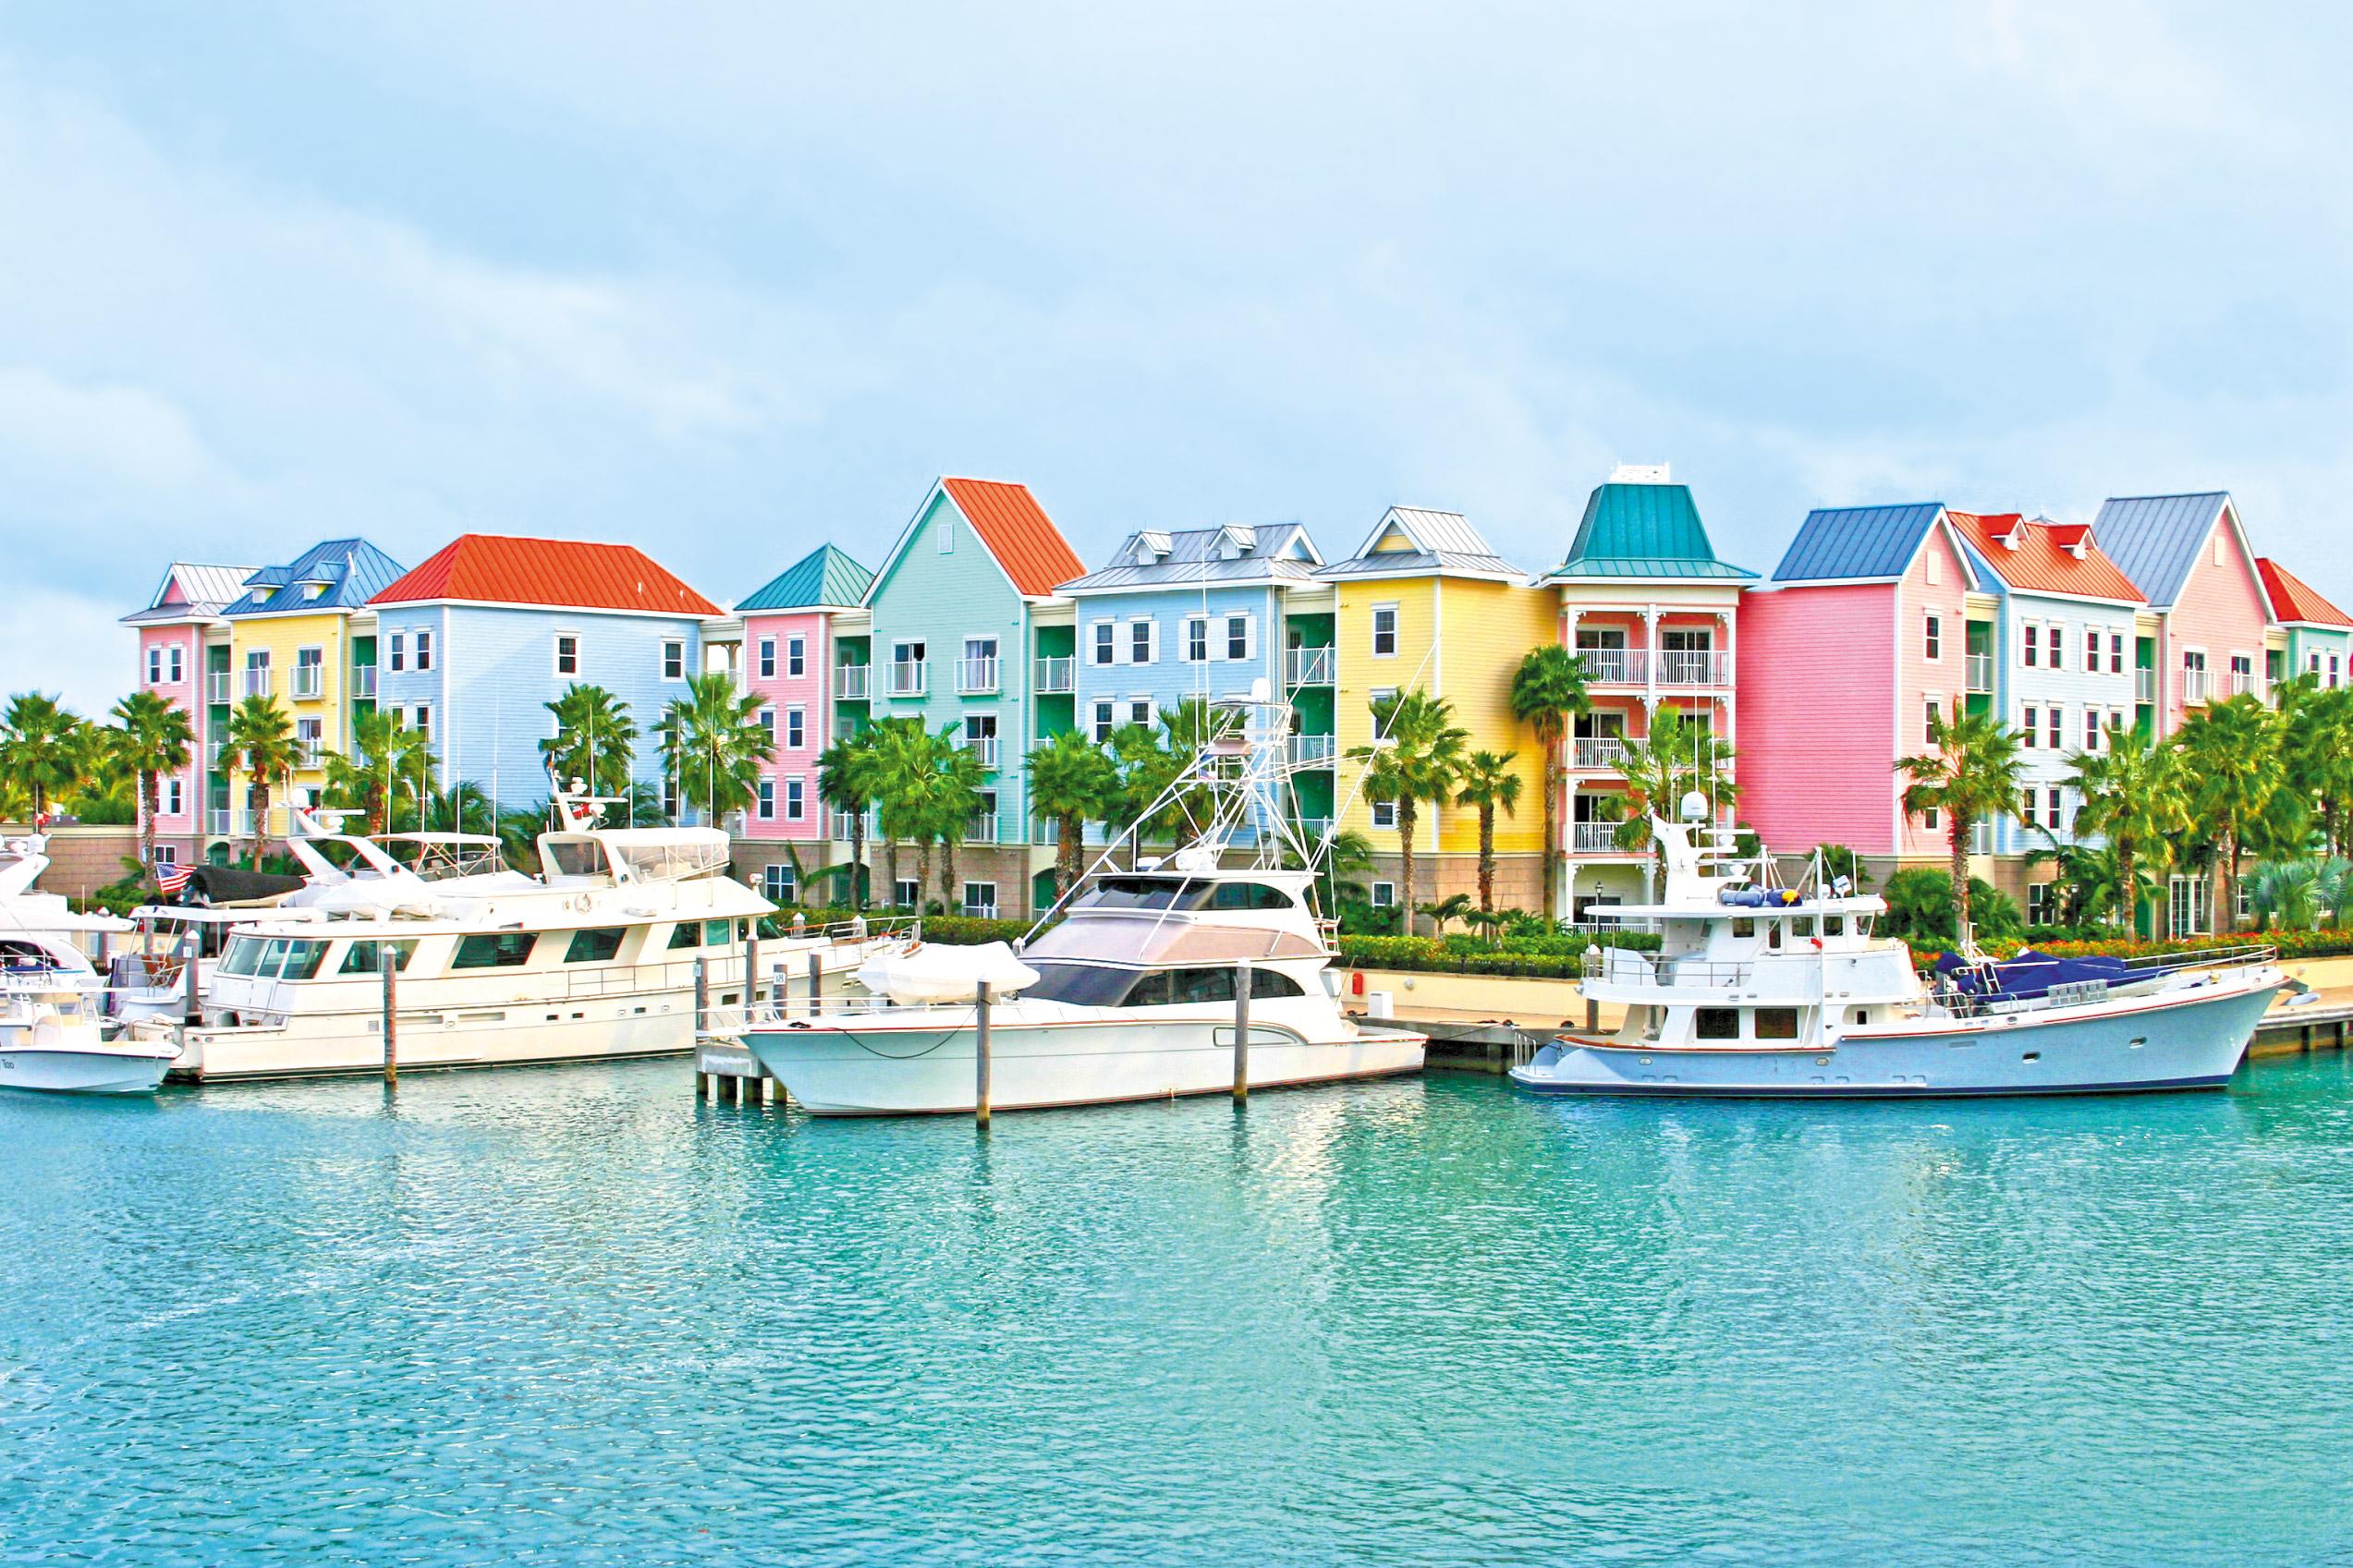 Noleggio Barche Nassau (Bahamas) - Navalia | Noleggia un Sogno